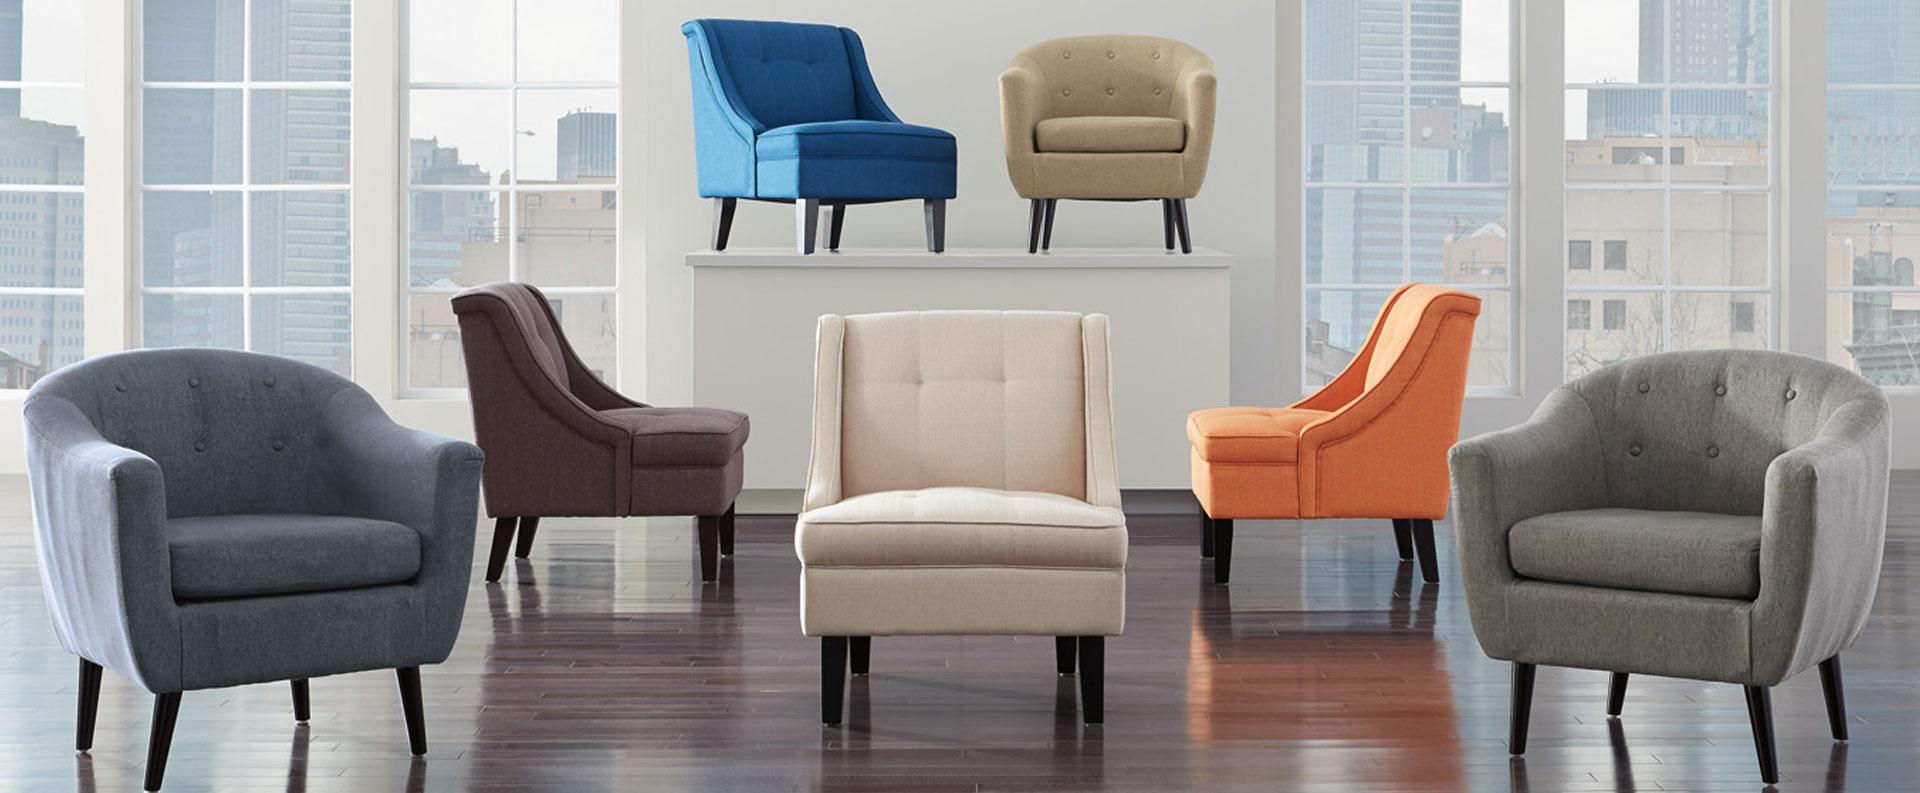 Lovely Furniture Liquidators   Baton Rouge, LA